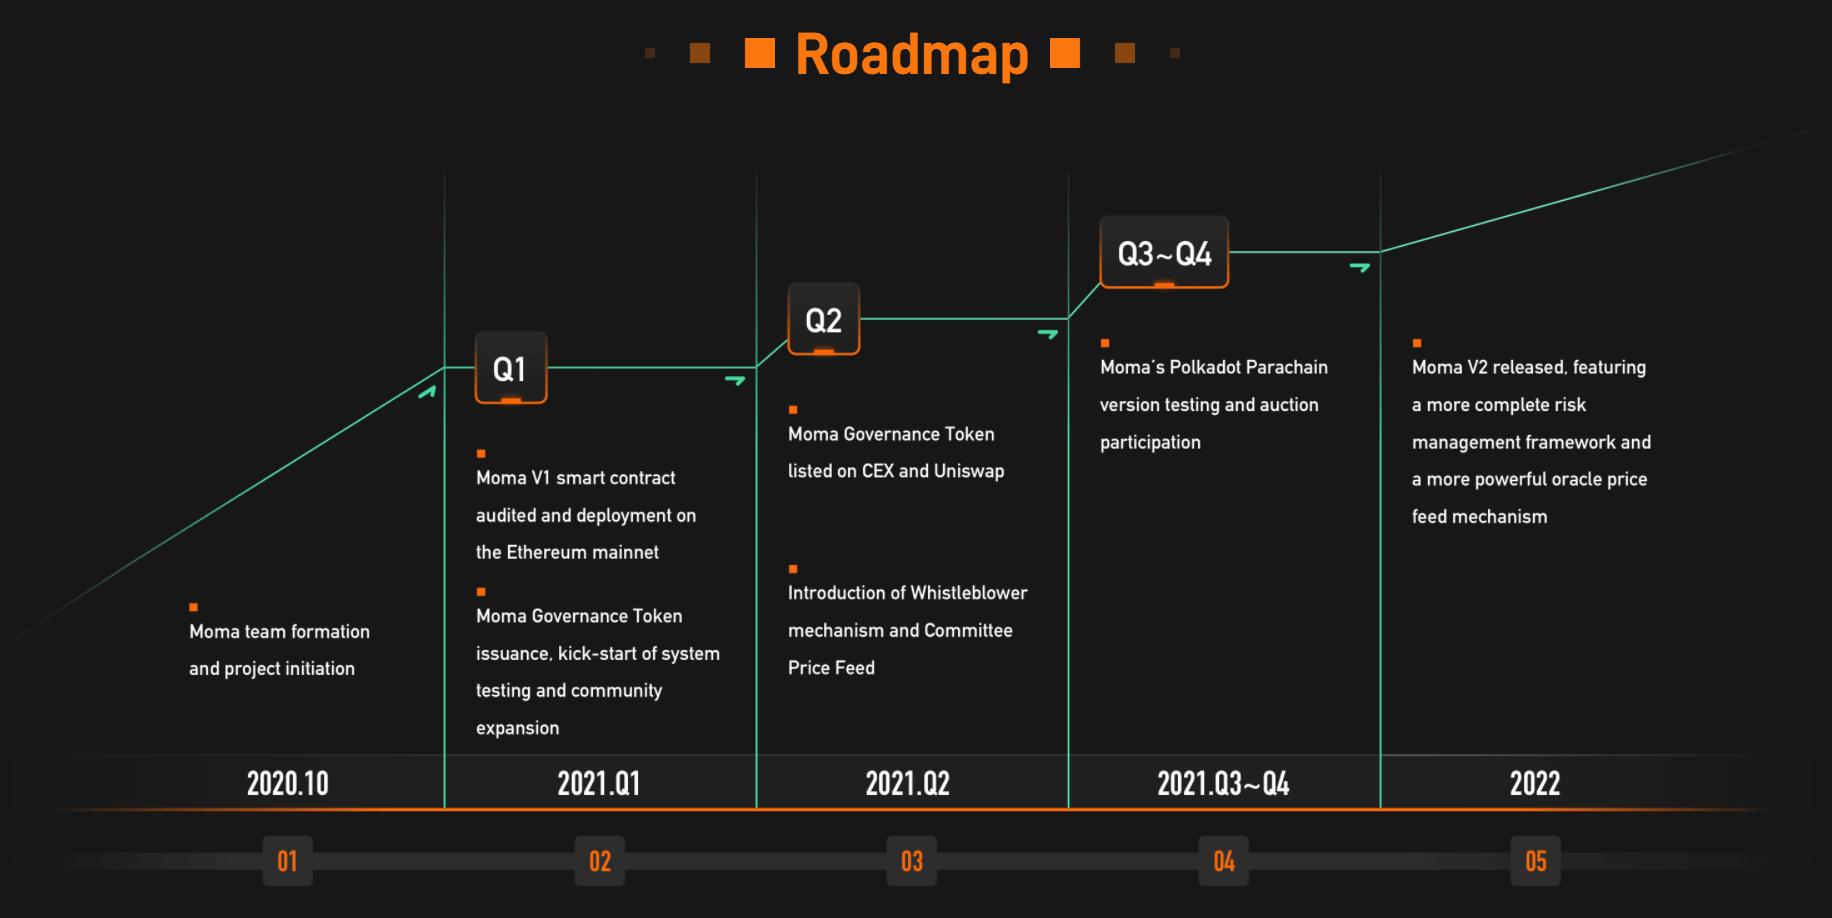 Roadmap MOMAT